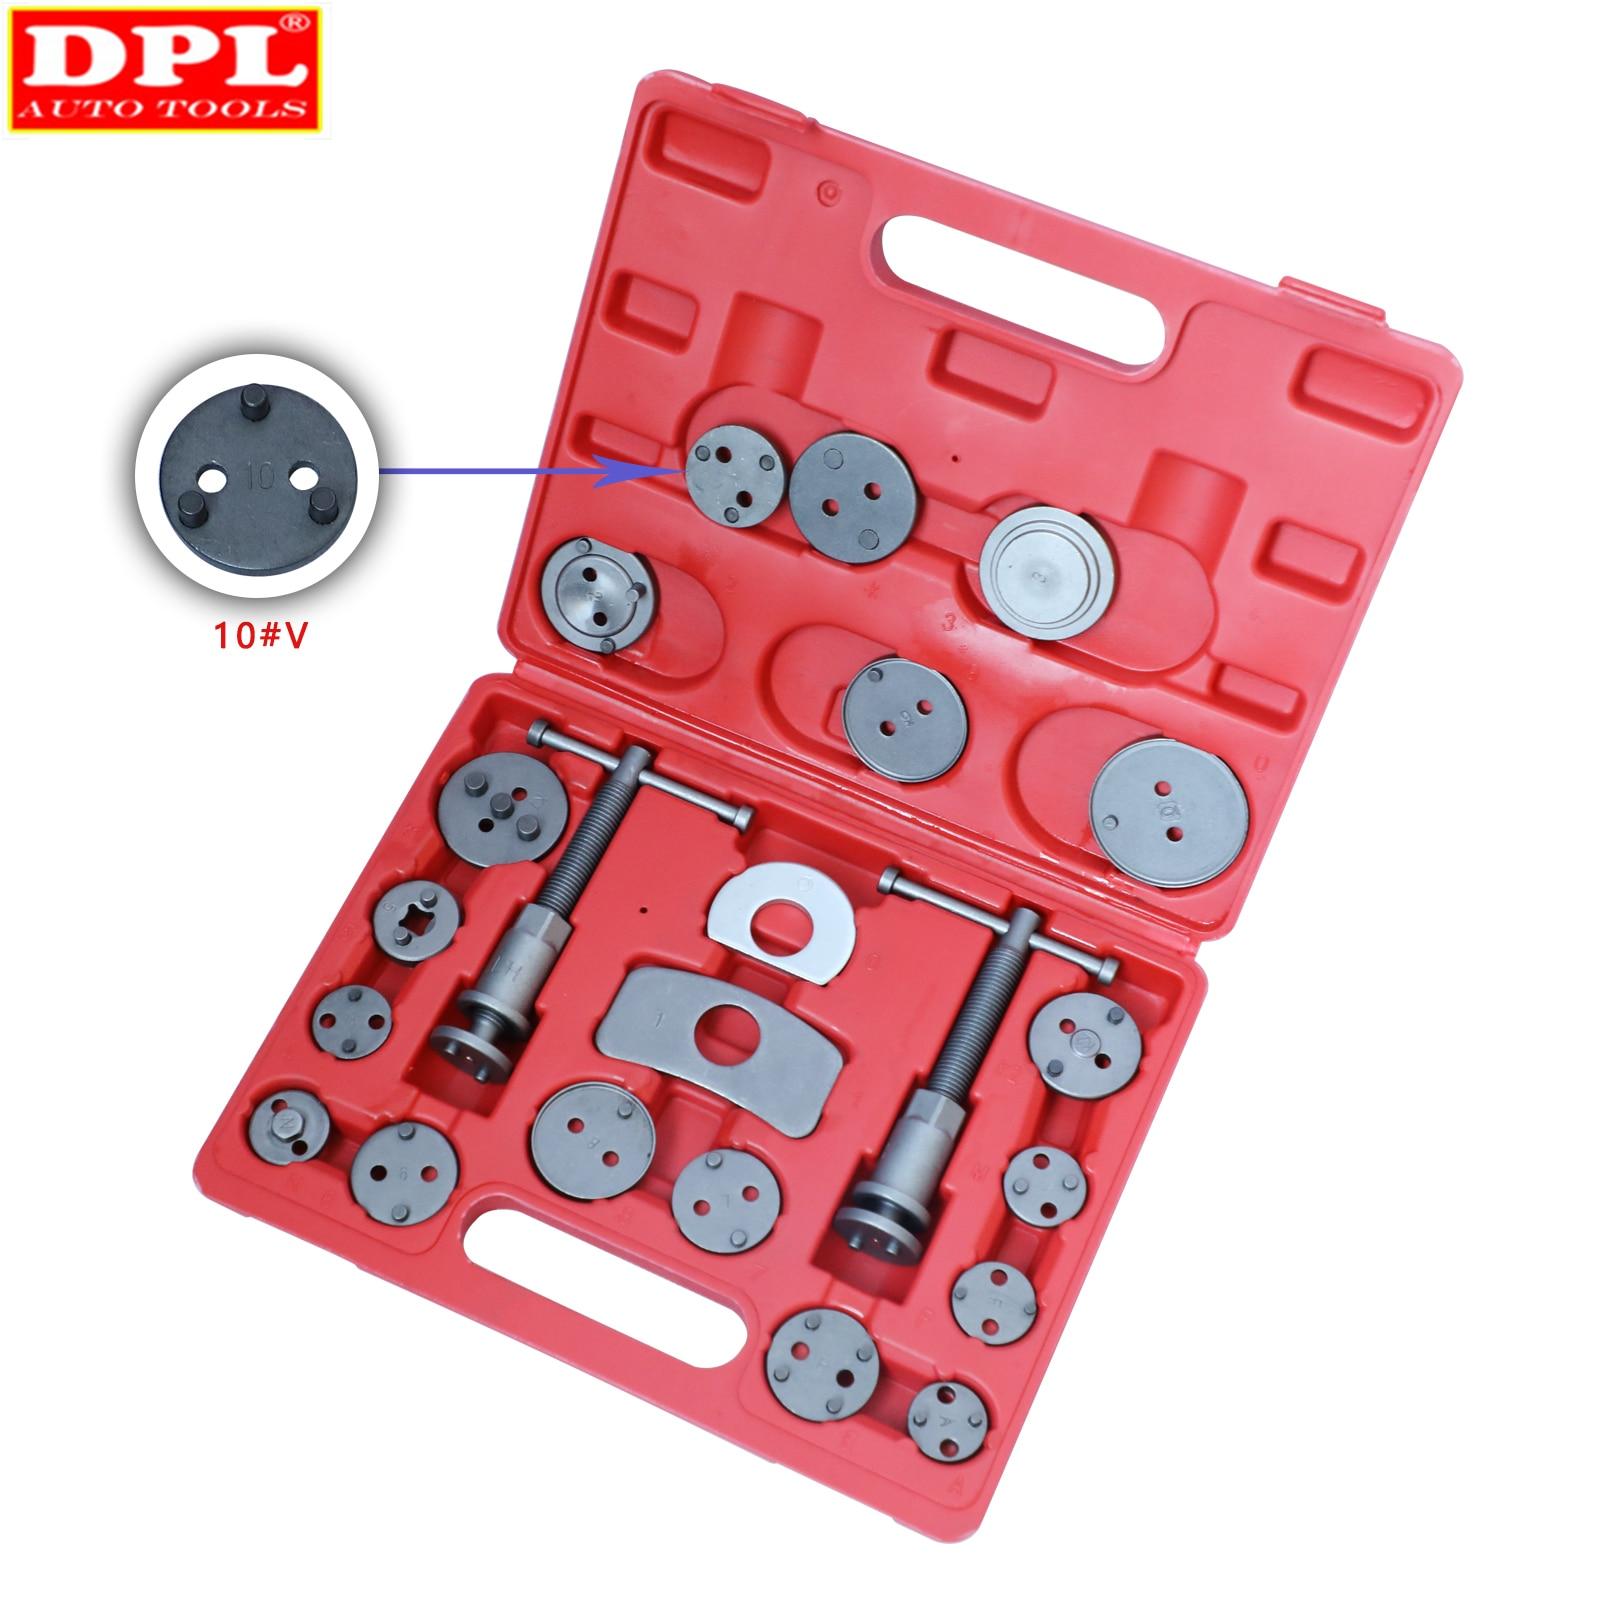 22pcs Universal Car Disc Brake Caliper Wind Back Brake Piston Compressor Tool Kit For Most Automobiles Garage Repair Tools Super Offer C84fe Cicig